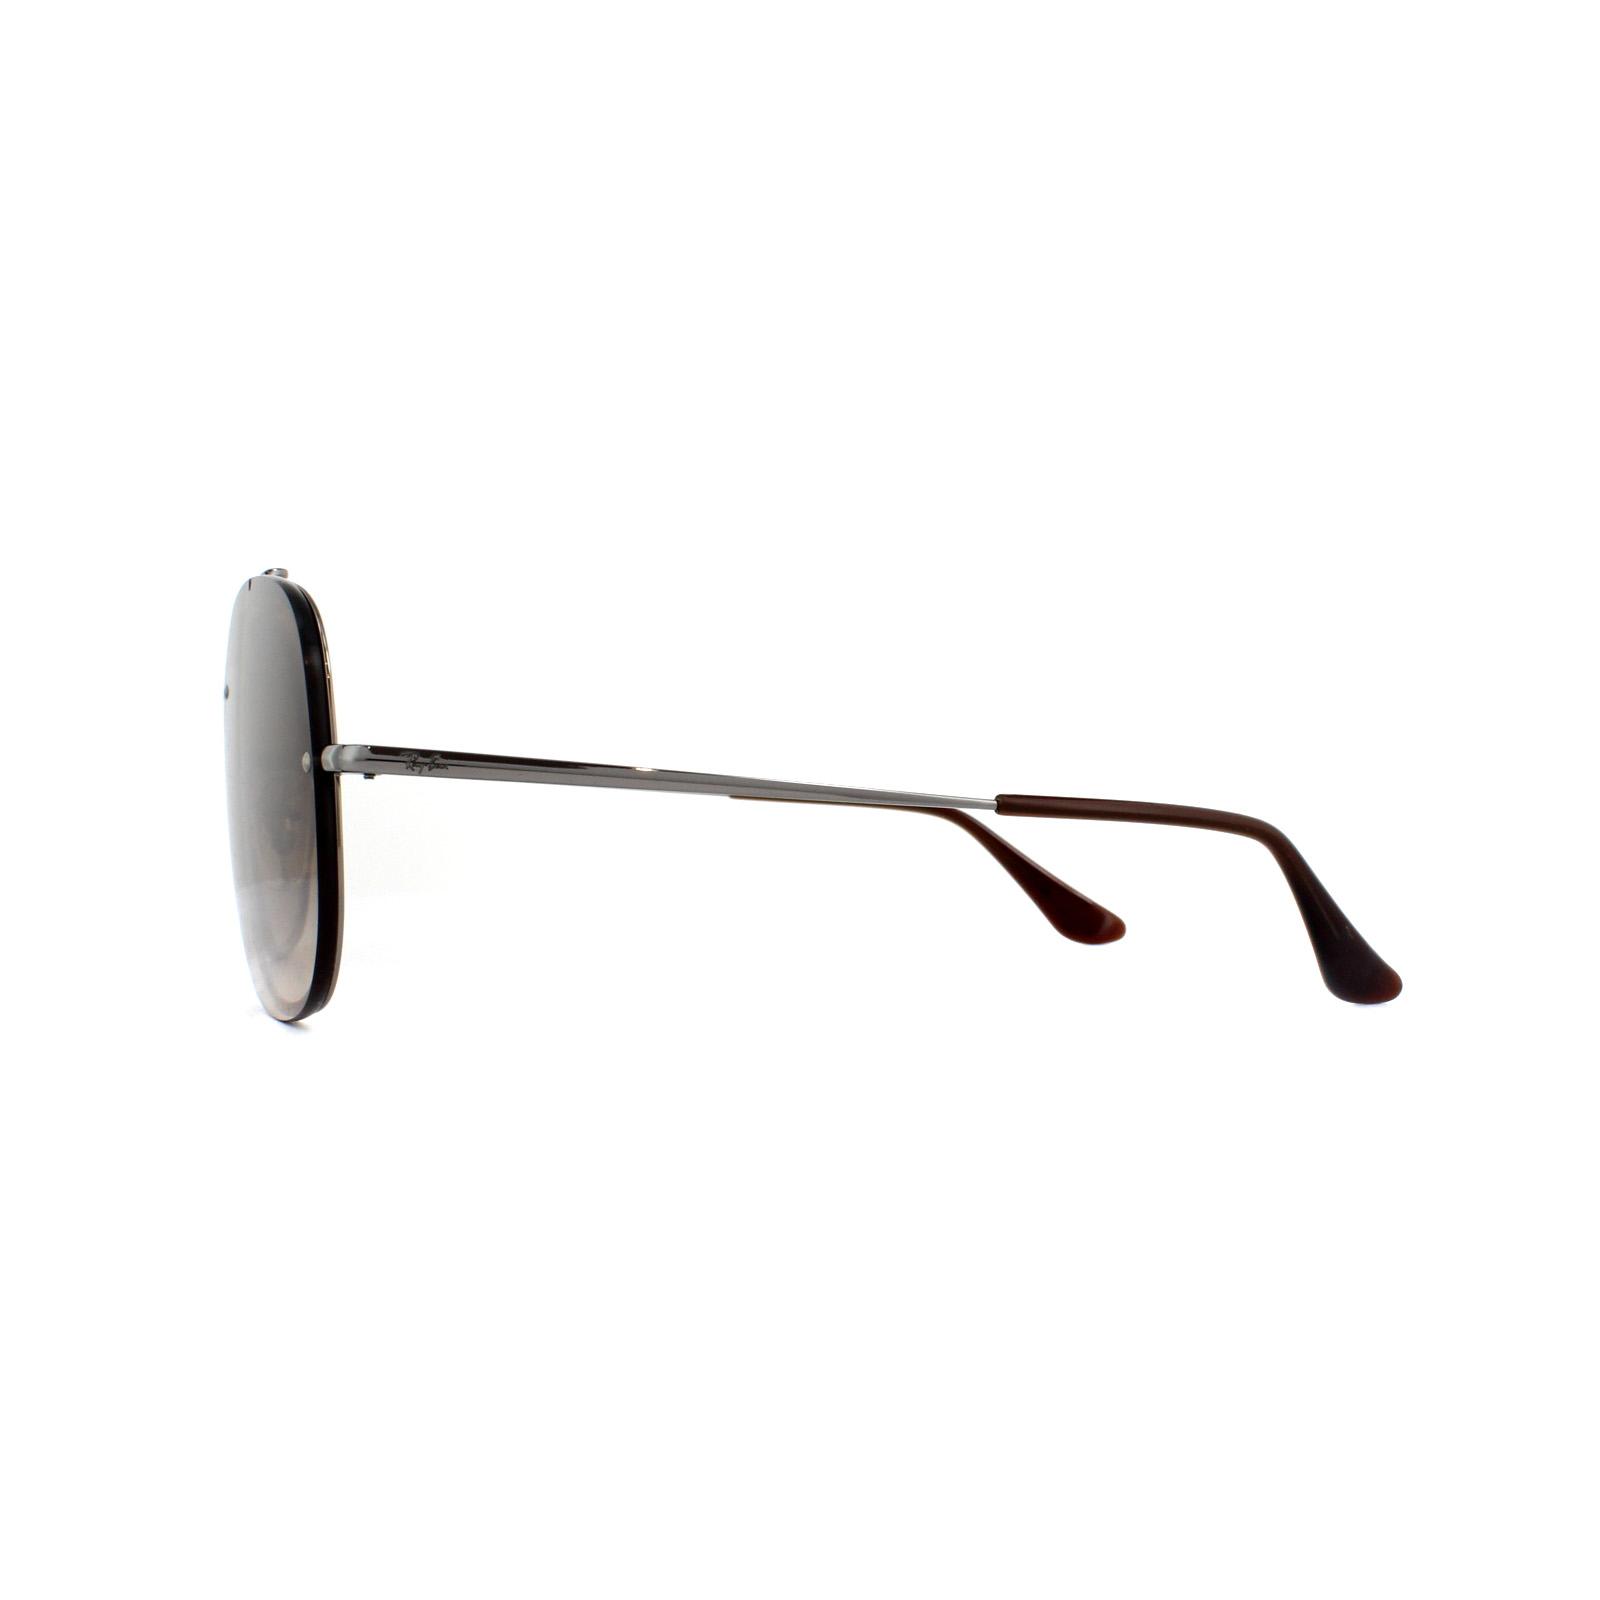 4a9af06244 Sentinel Ray-Ban Sunglasses Blaze The General RB3583N 004 13 Gunmetal Brown  Gradient